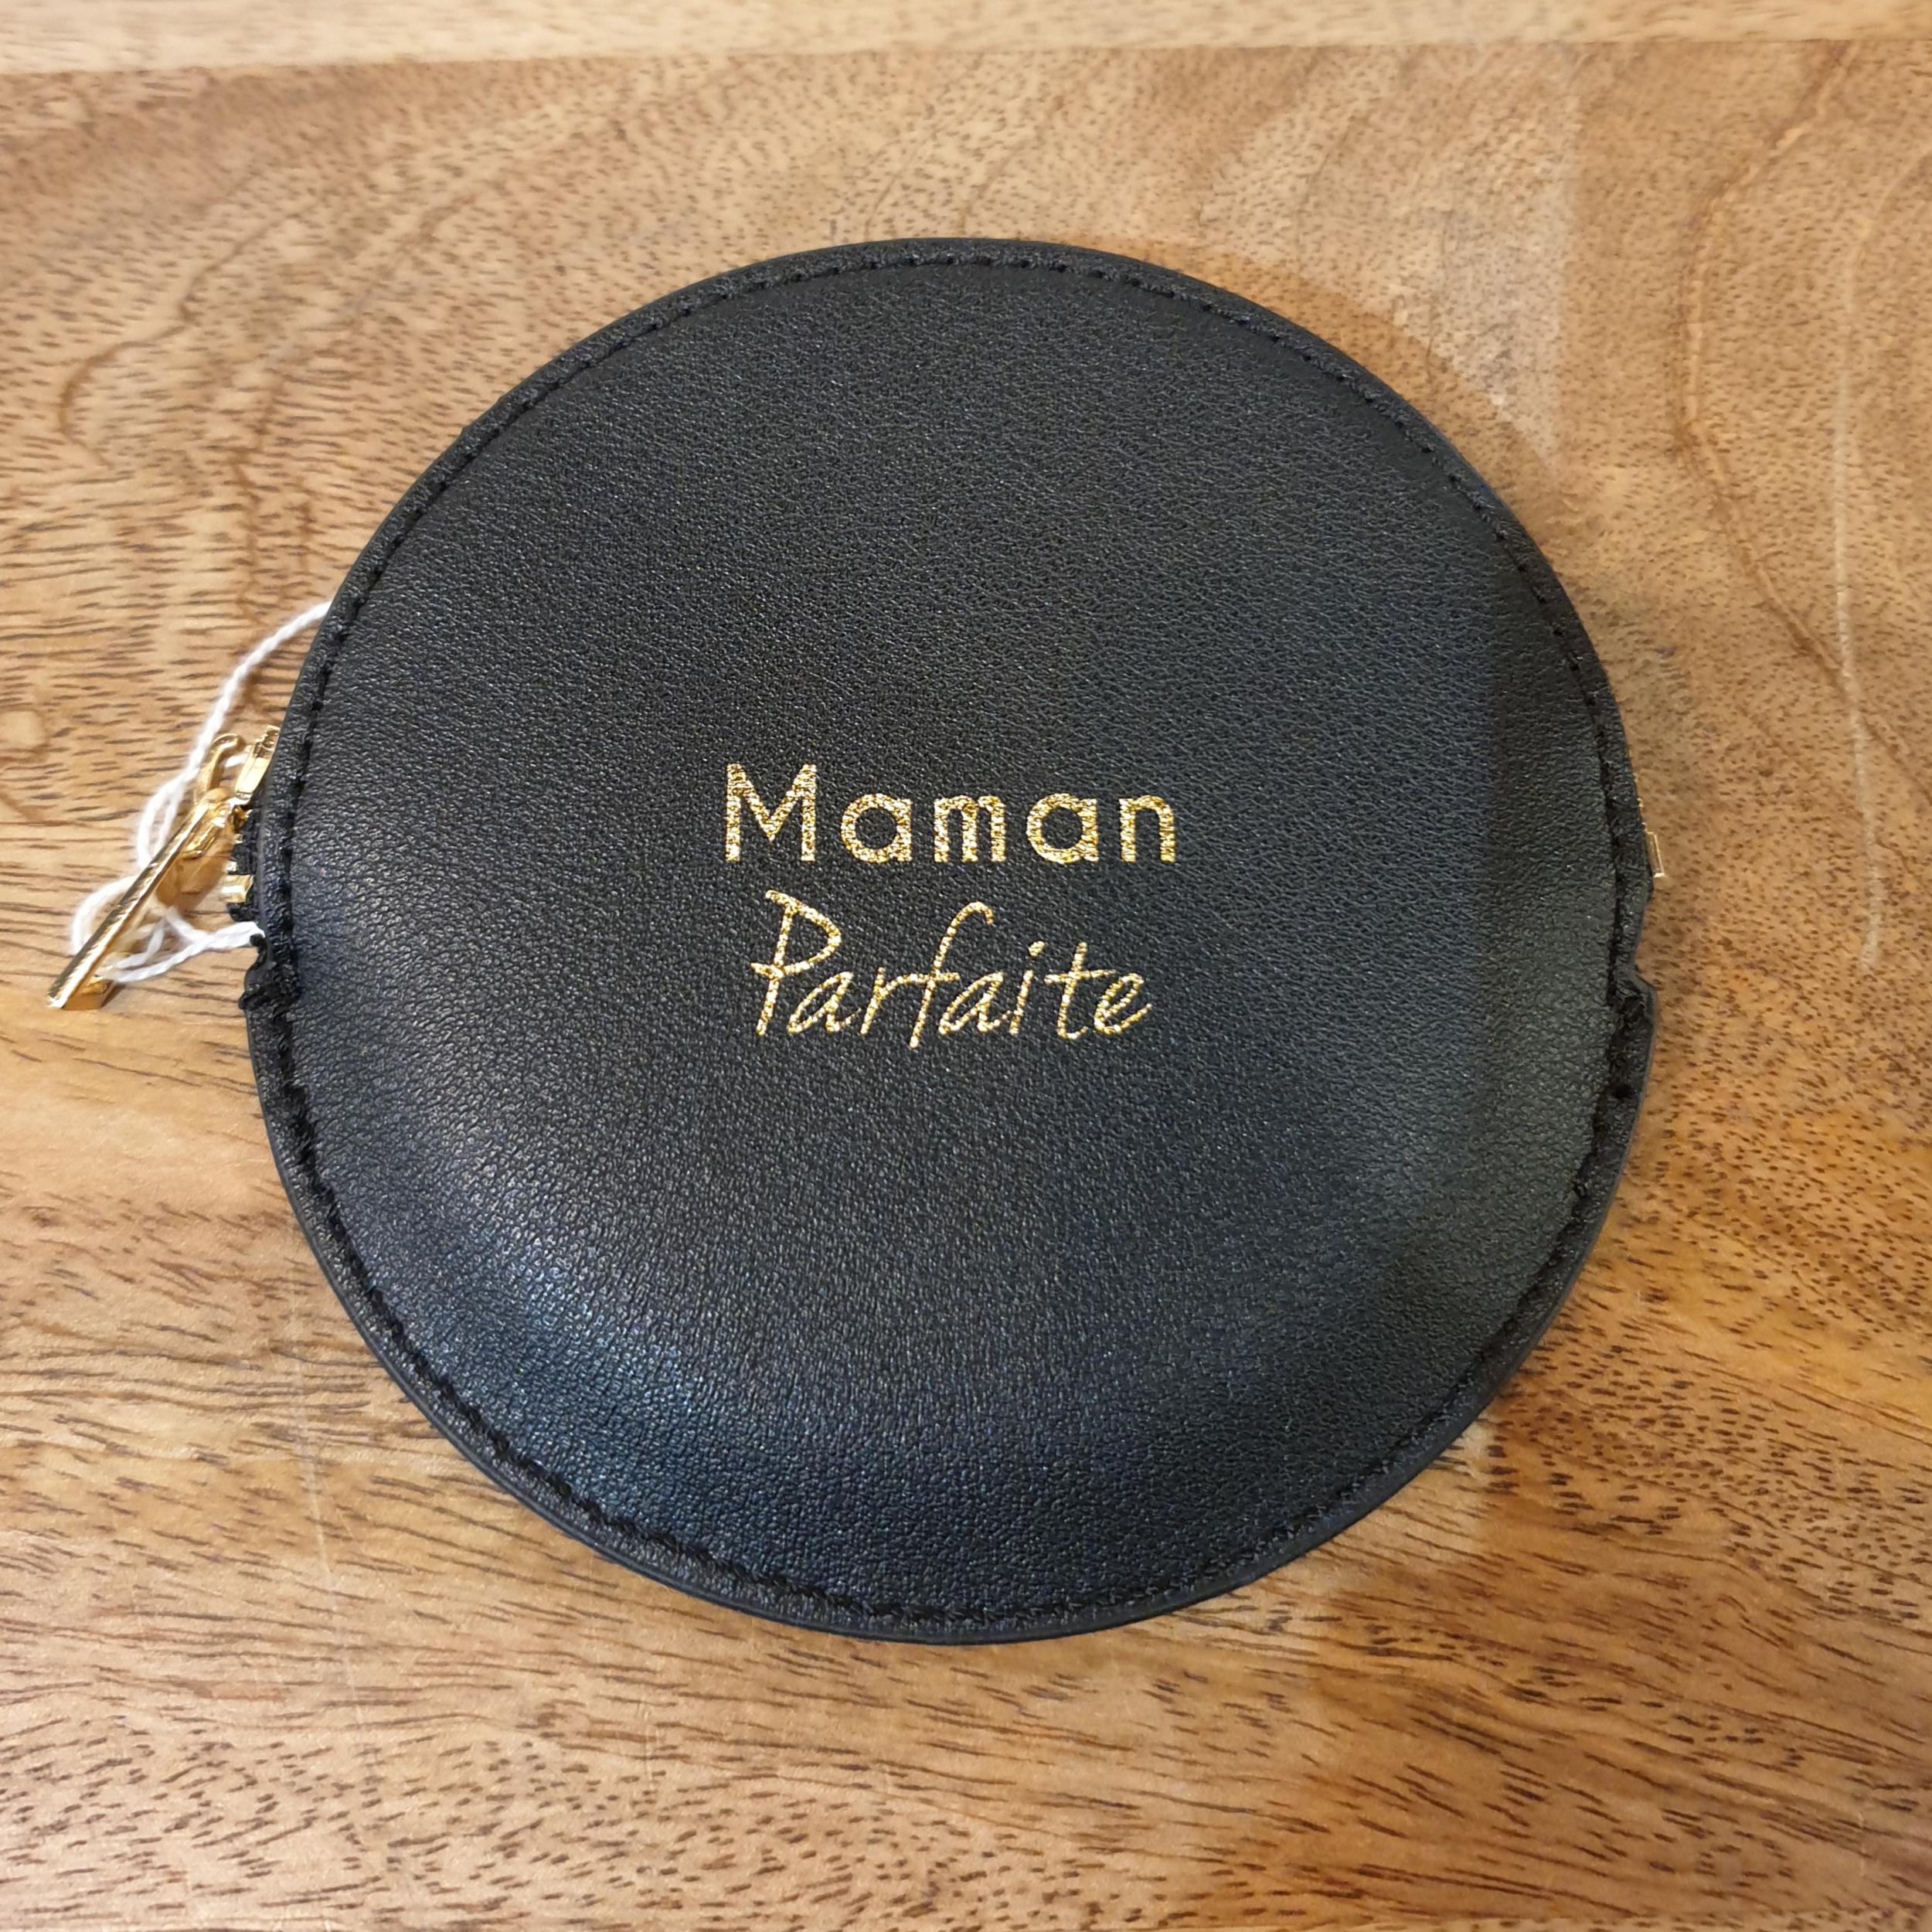 Porte-monnaie maman parfaite